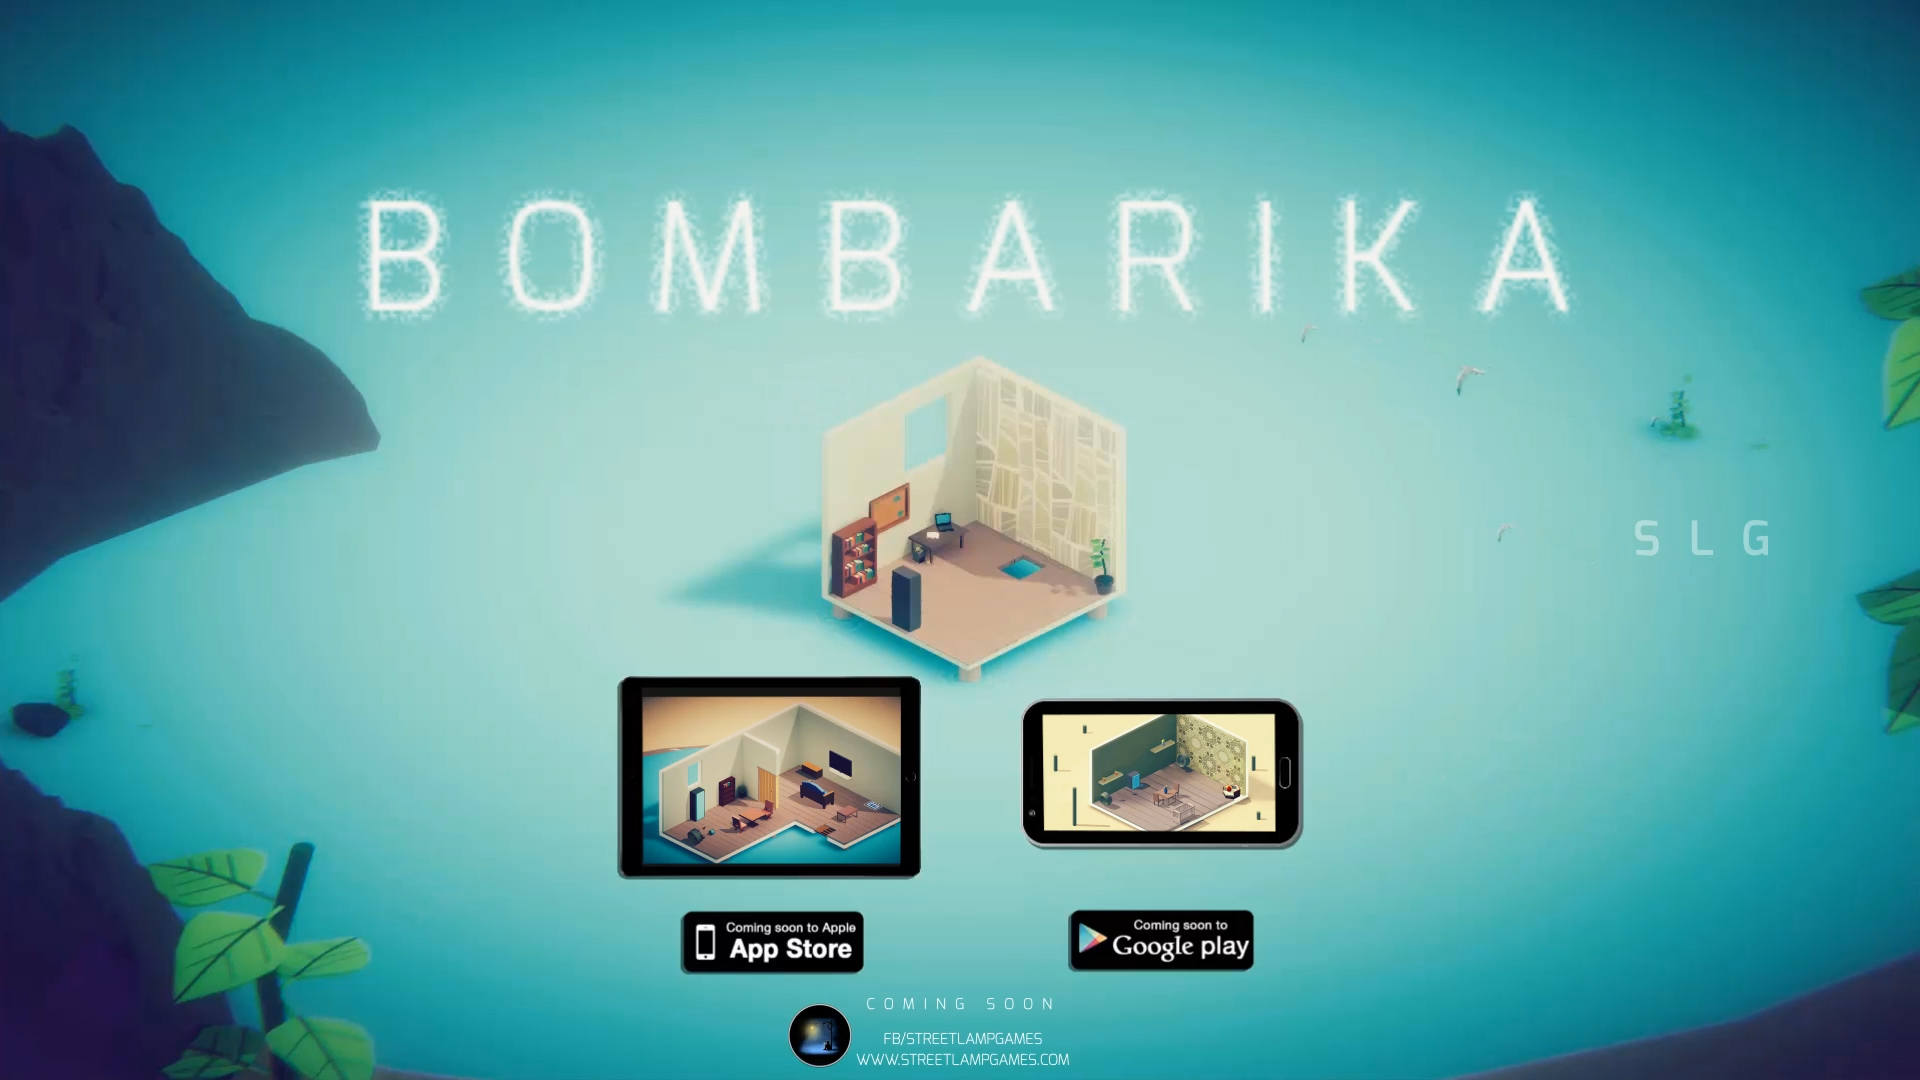 BOMBARIKA Mobile Game Trailer